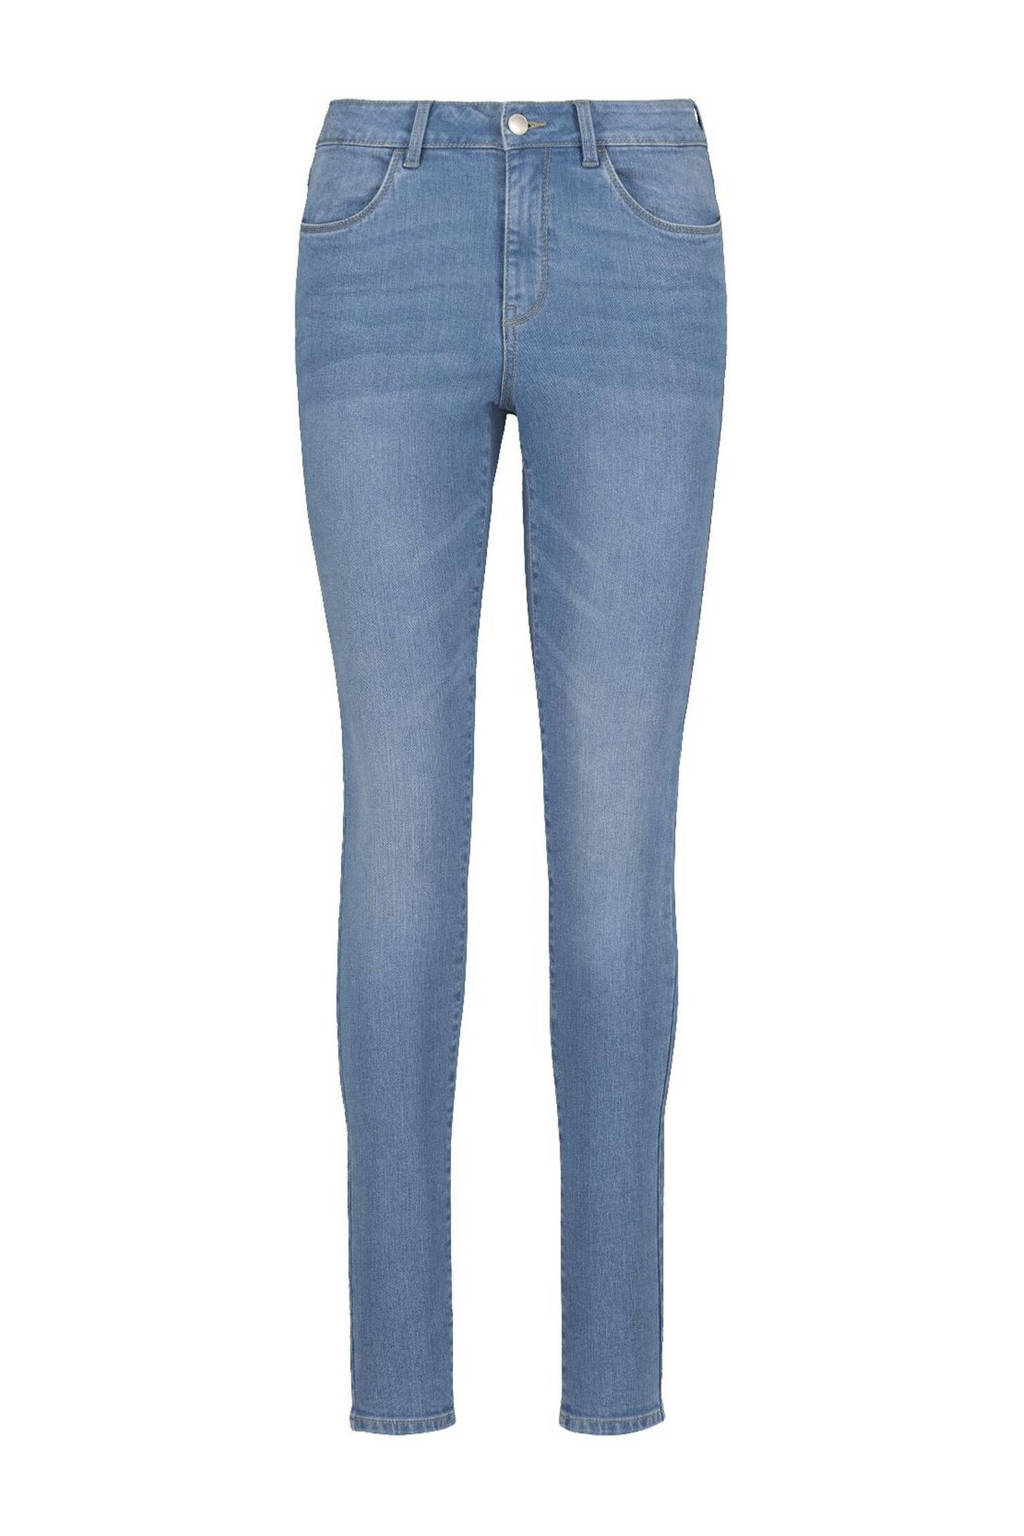 HEMA skinny jeans blauw, Blauw